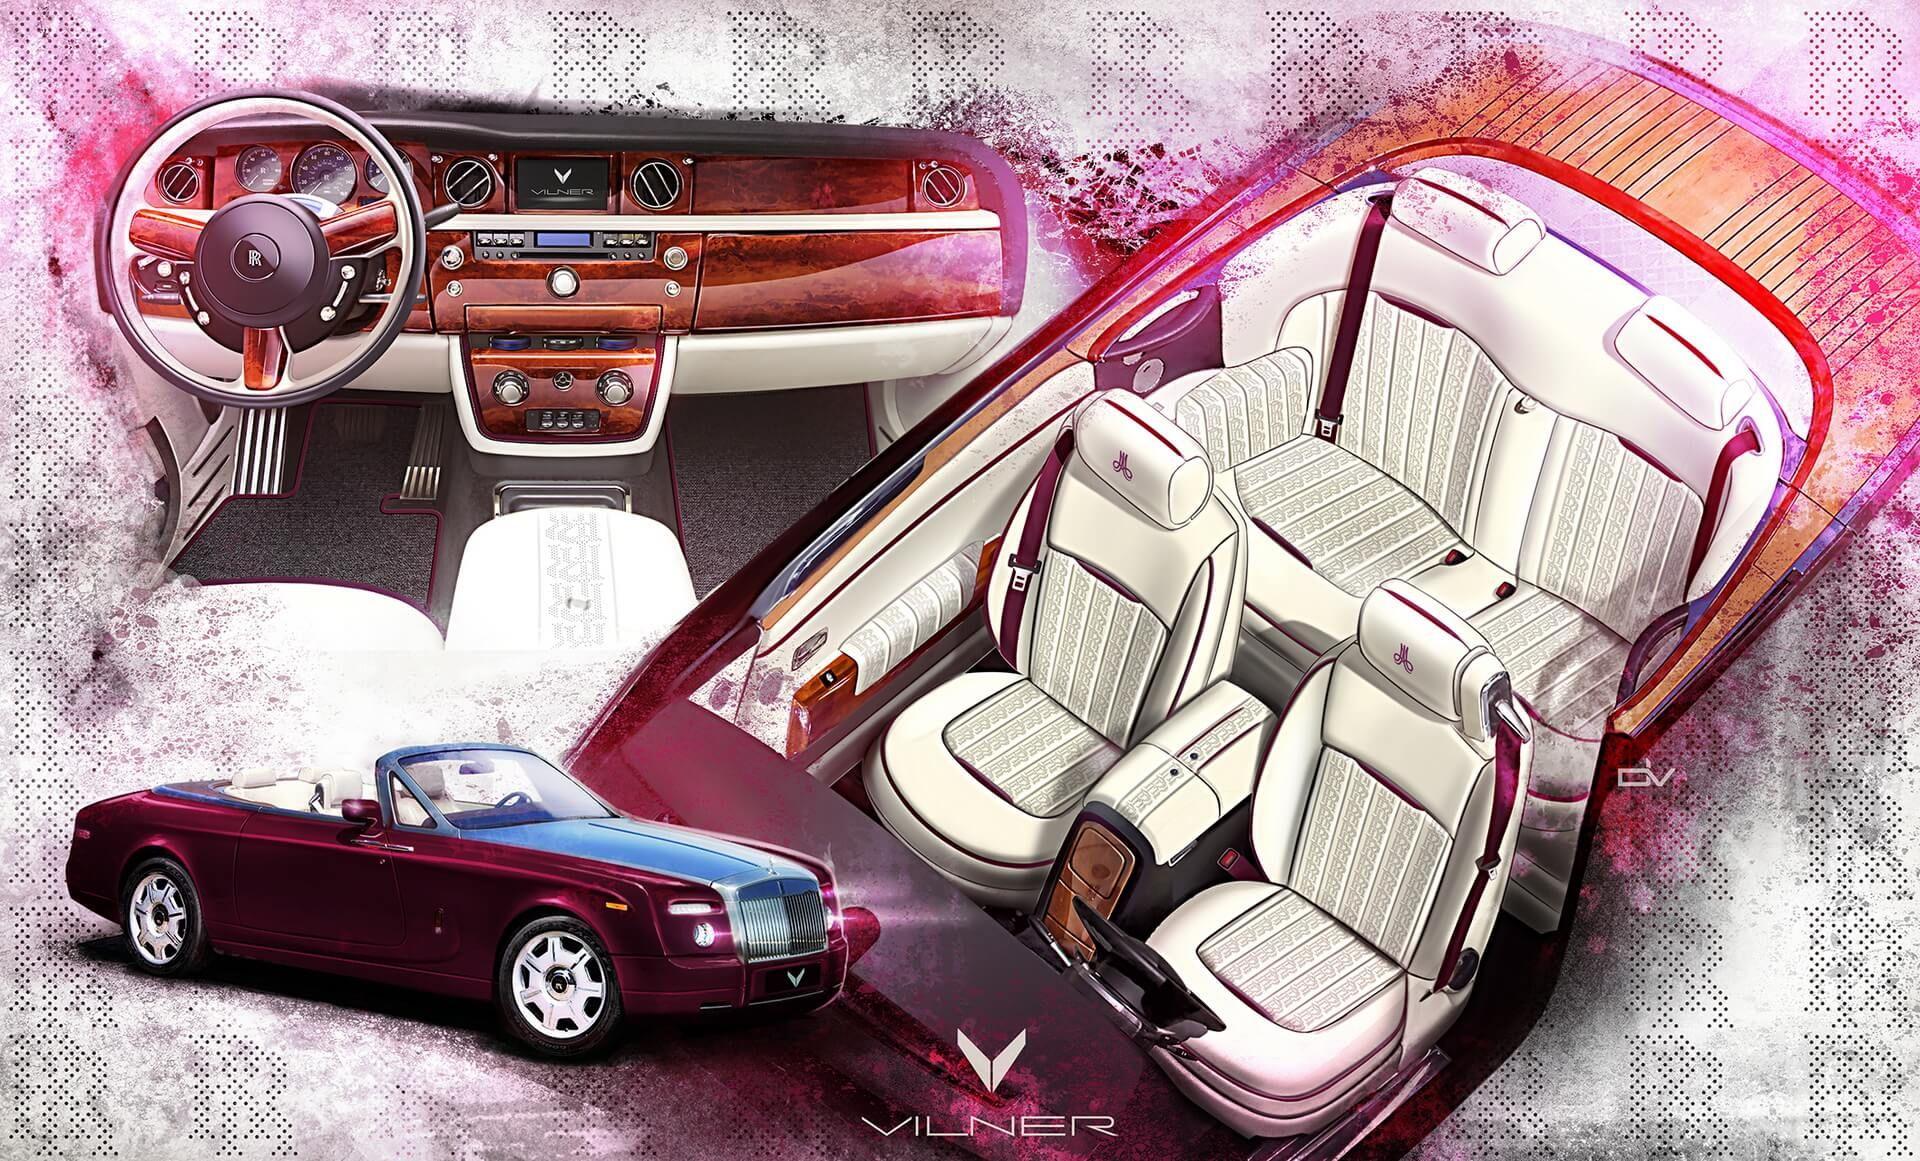 Rolls-Royce_Phantom_Drophead_Coupe_By_Vilner_0000